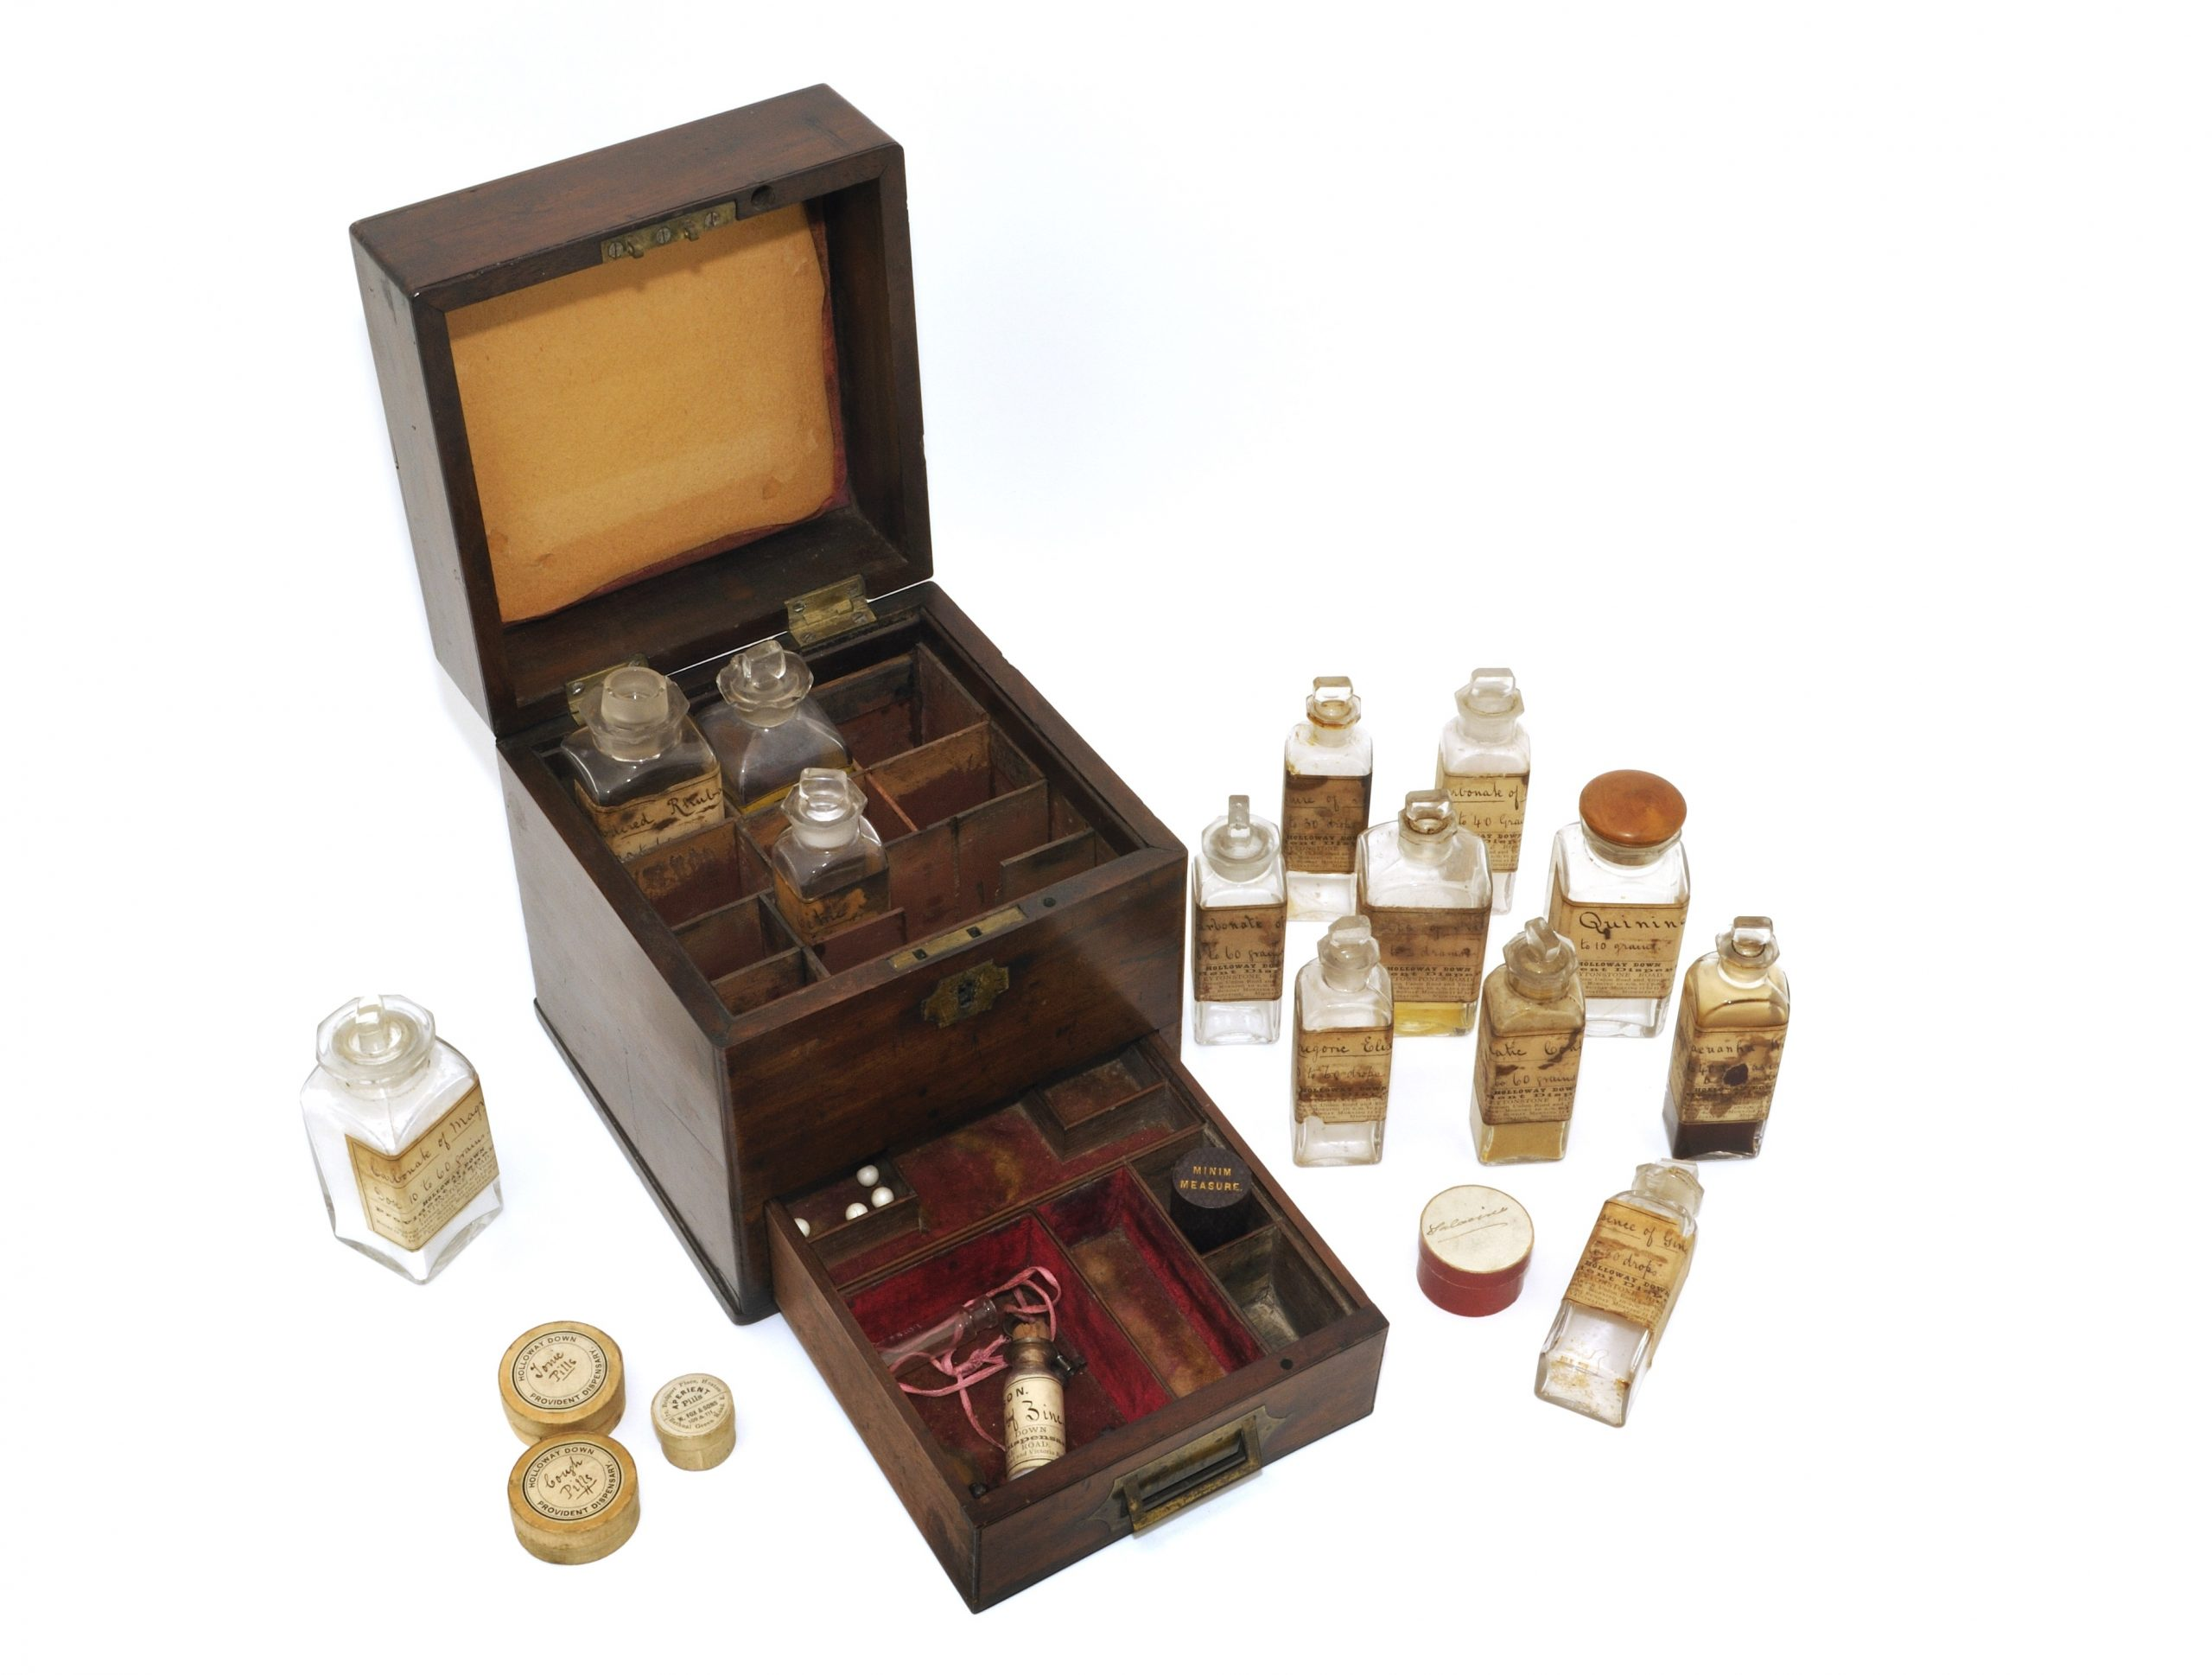 Florence Nightingale's Medicine Chest